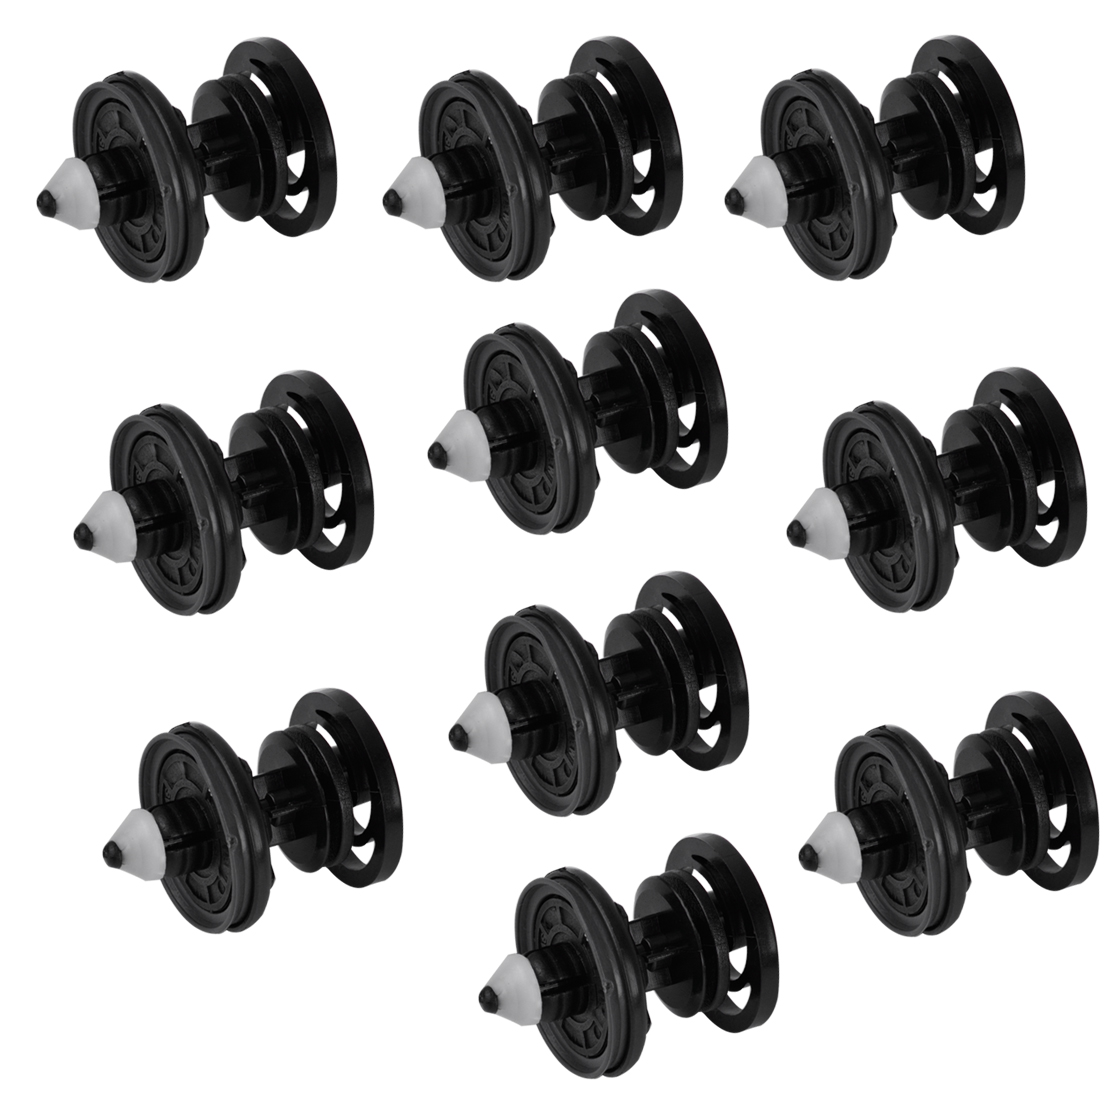 DWCX 10Pcs Black Interior Nylon Door Trim Panel Push Type Fastener Clip  7L6868243 8679426 for Audi Q5 A4 VW Passat Golf Beetle